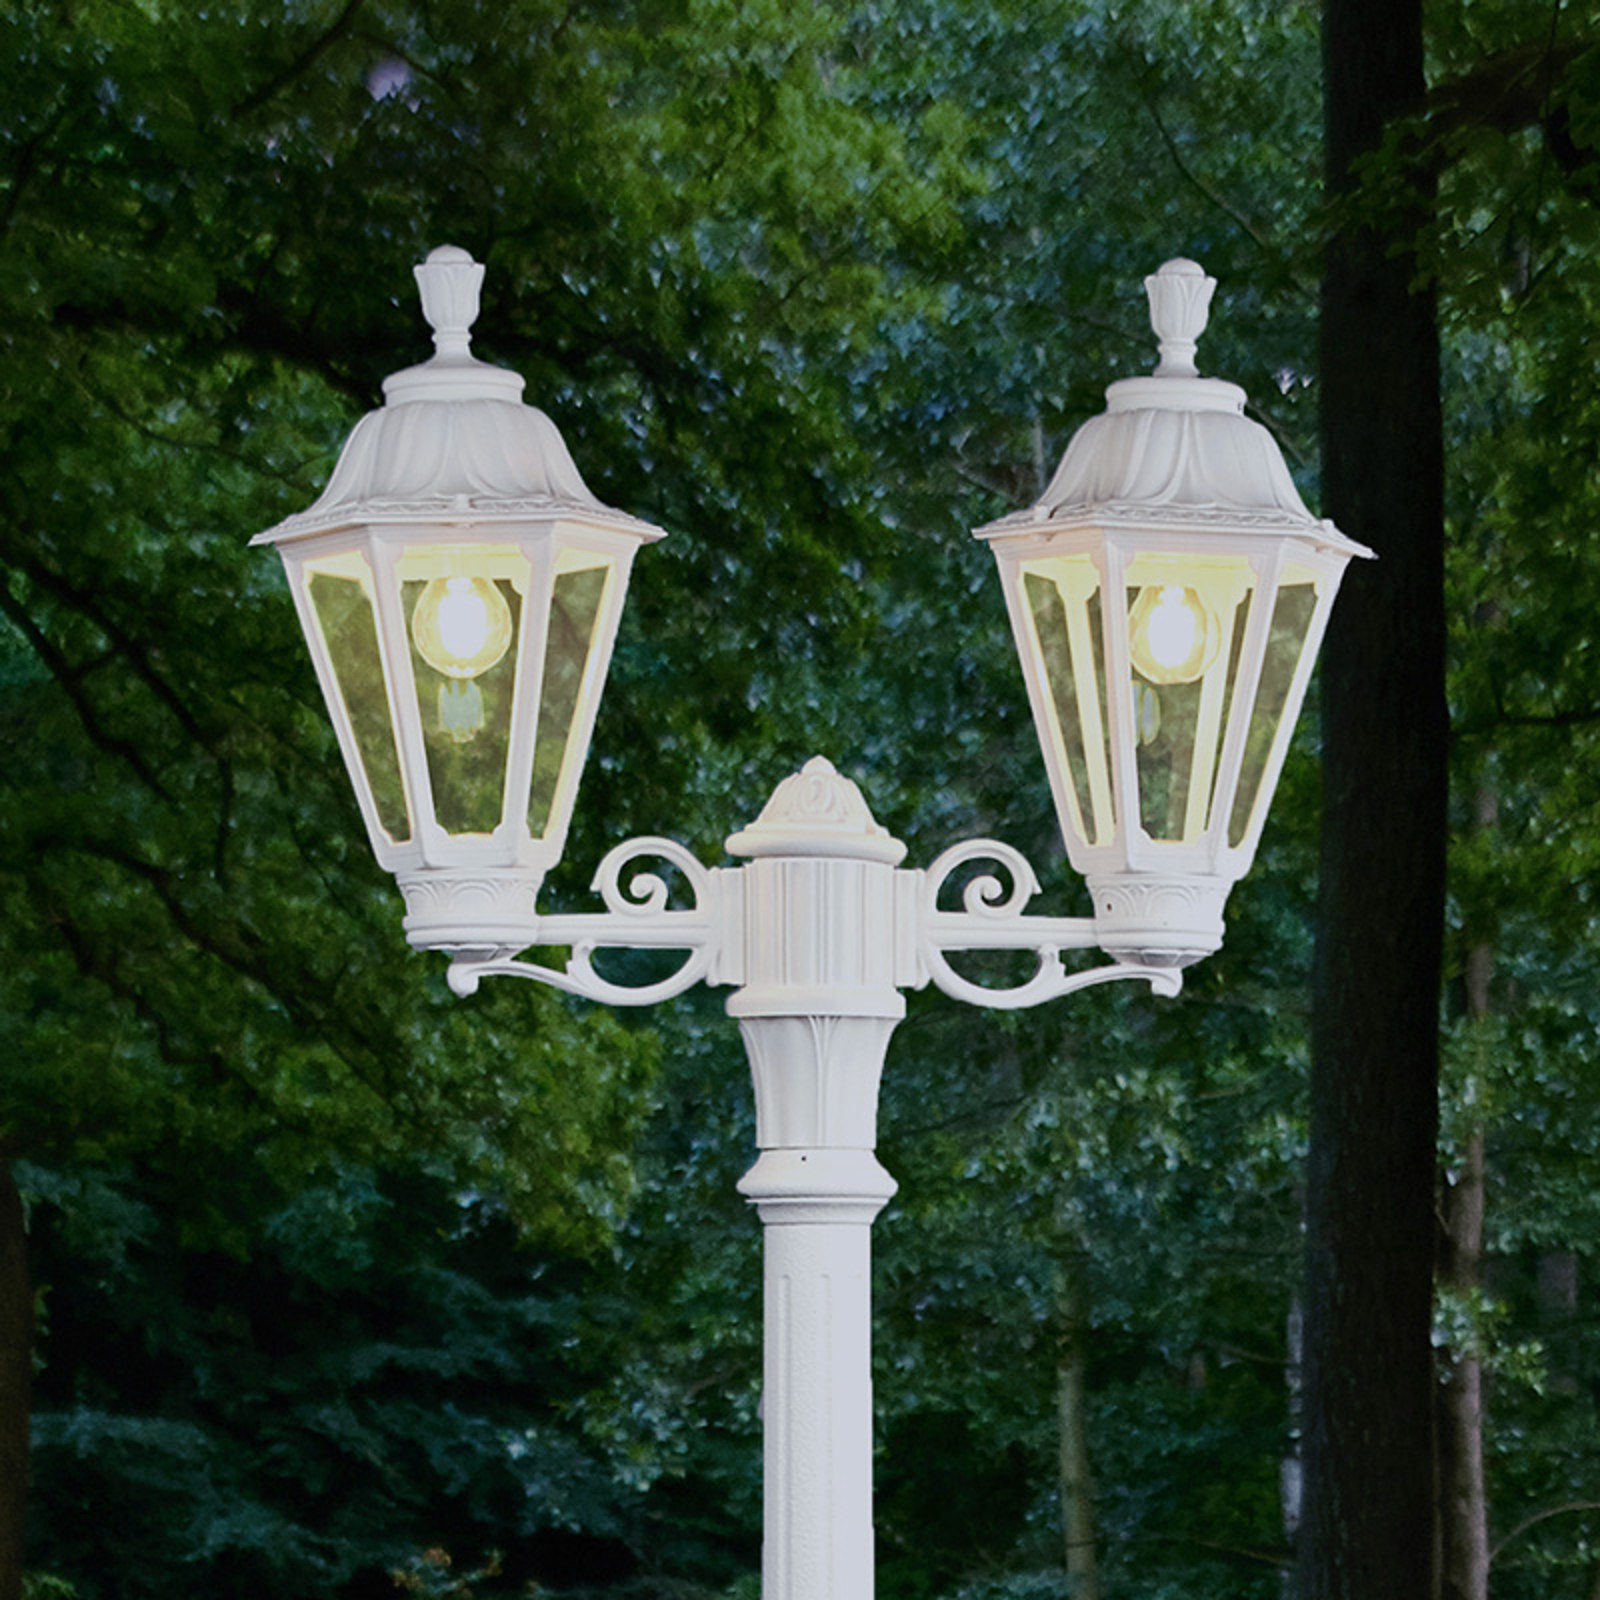 Lampadaire LED Artu Rut à 2 lampes, E27, blanc